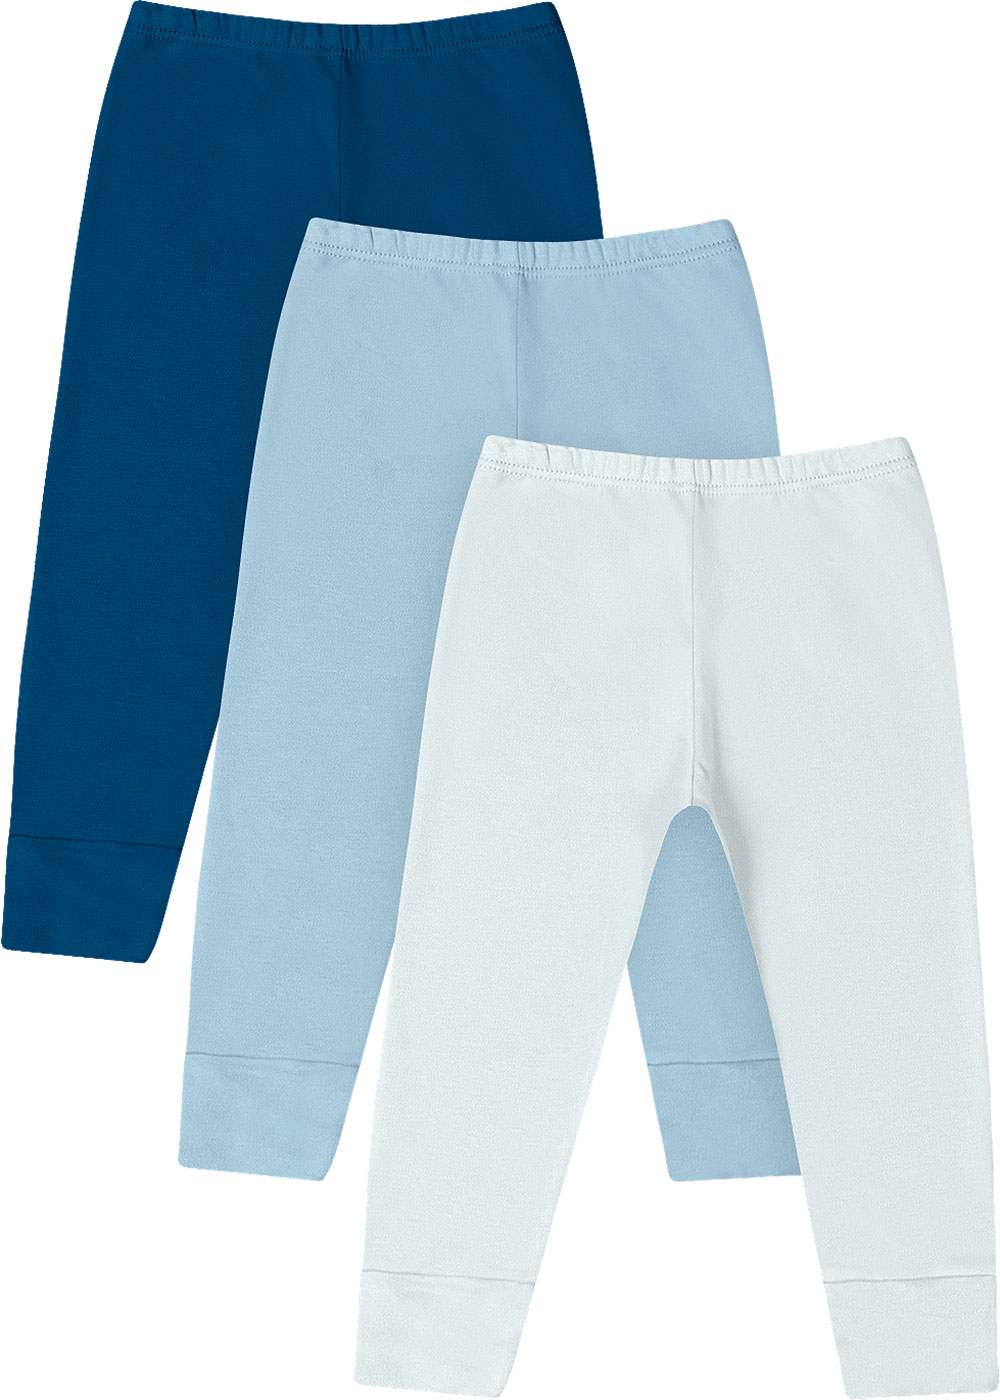 Calça Vira Pé Bebê Masculino Inverno Kit 3 Azul Lisos - Kiko e Kika